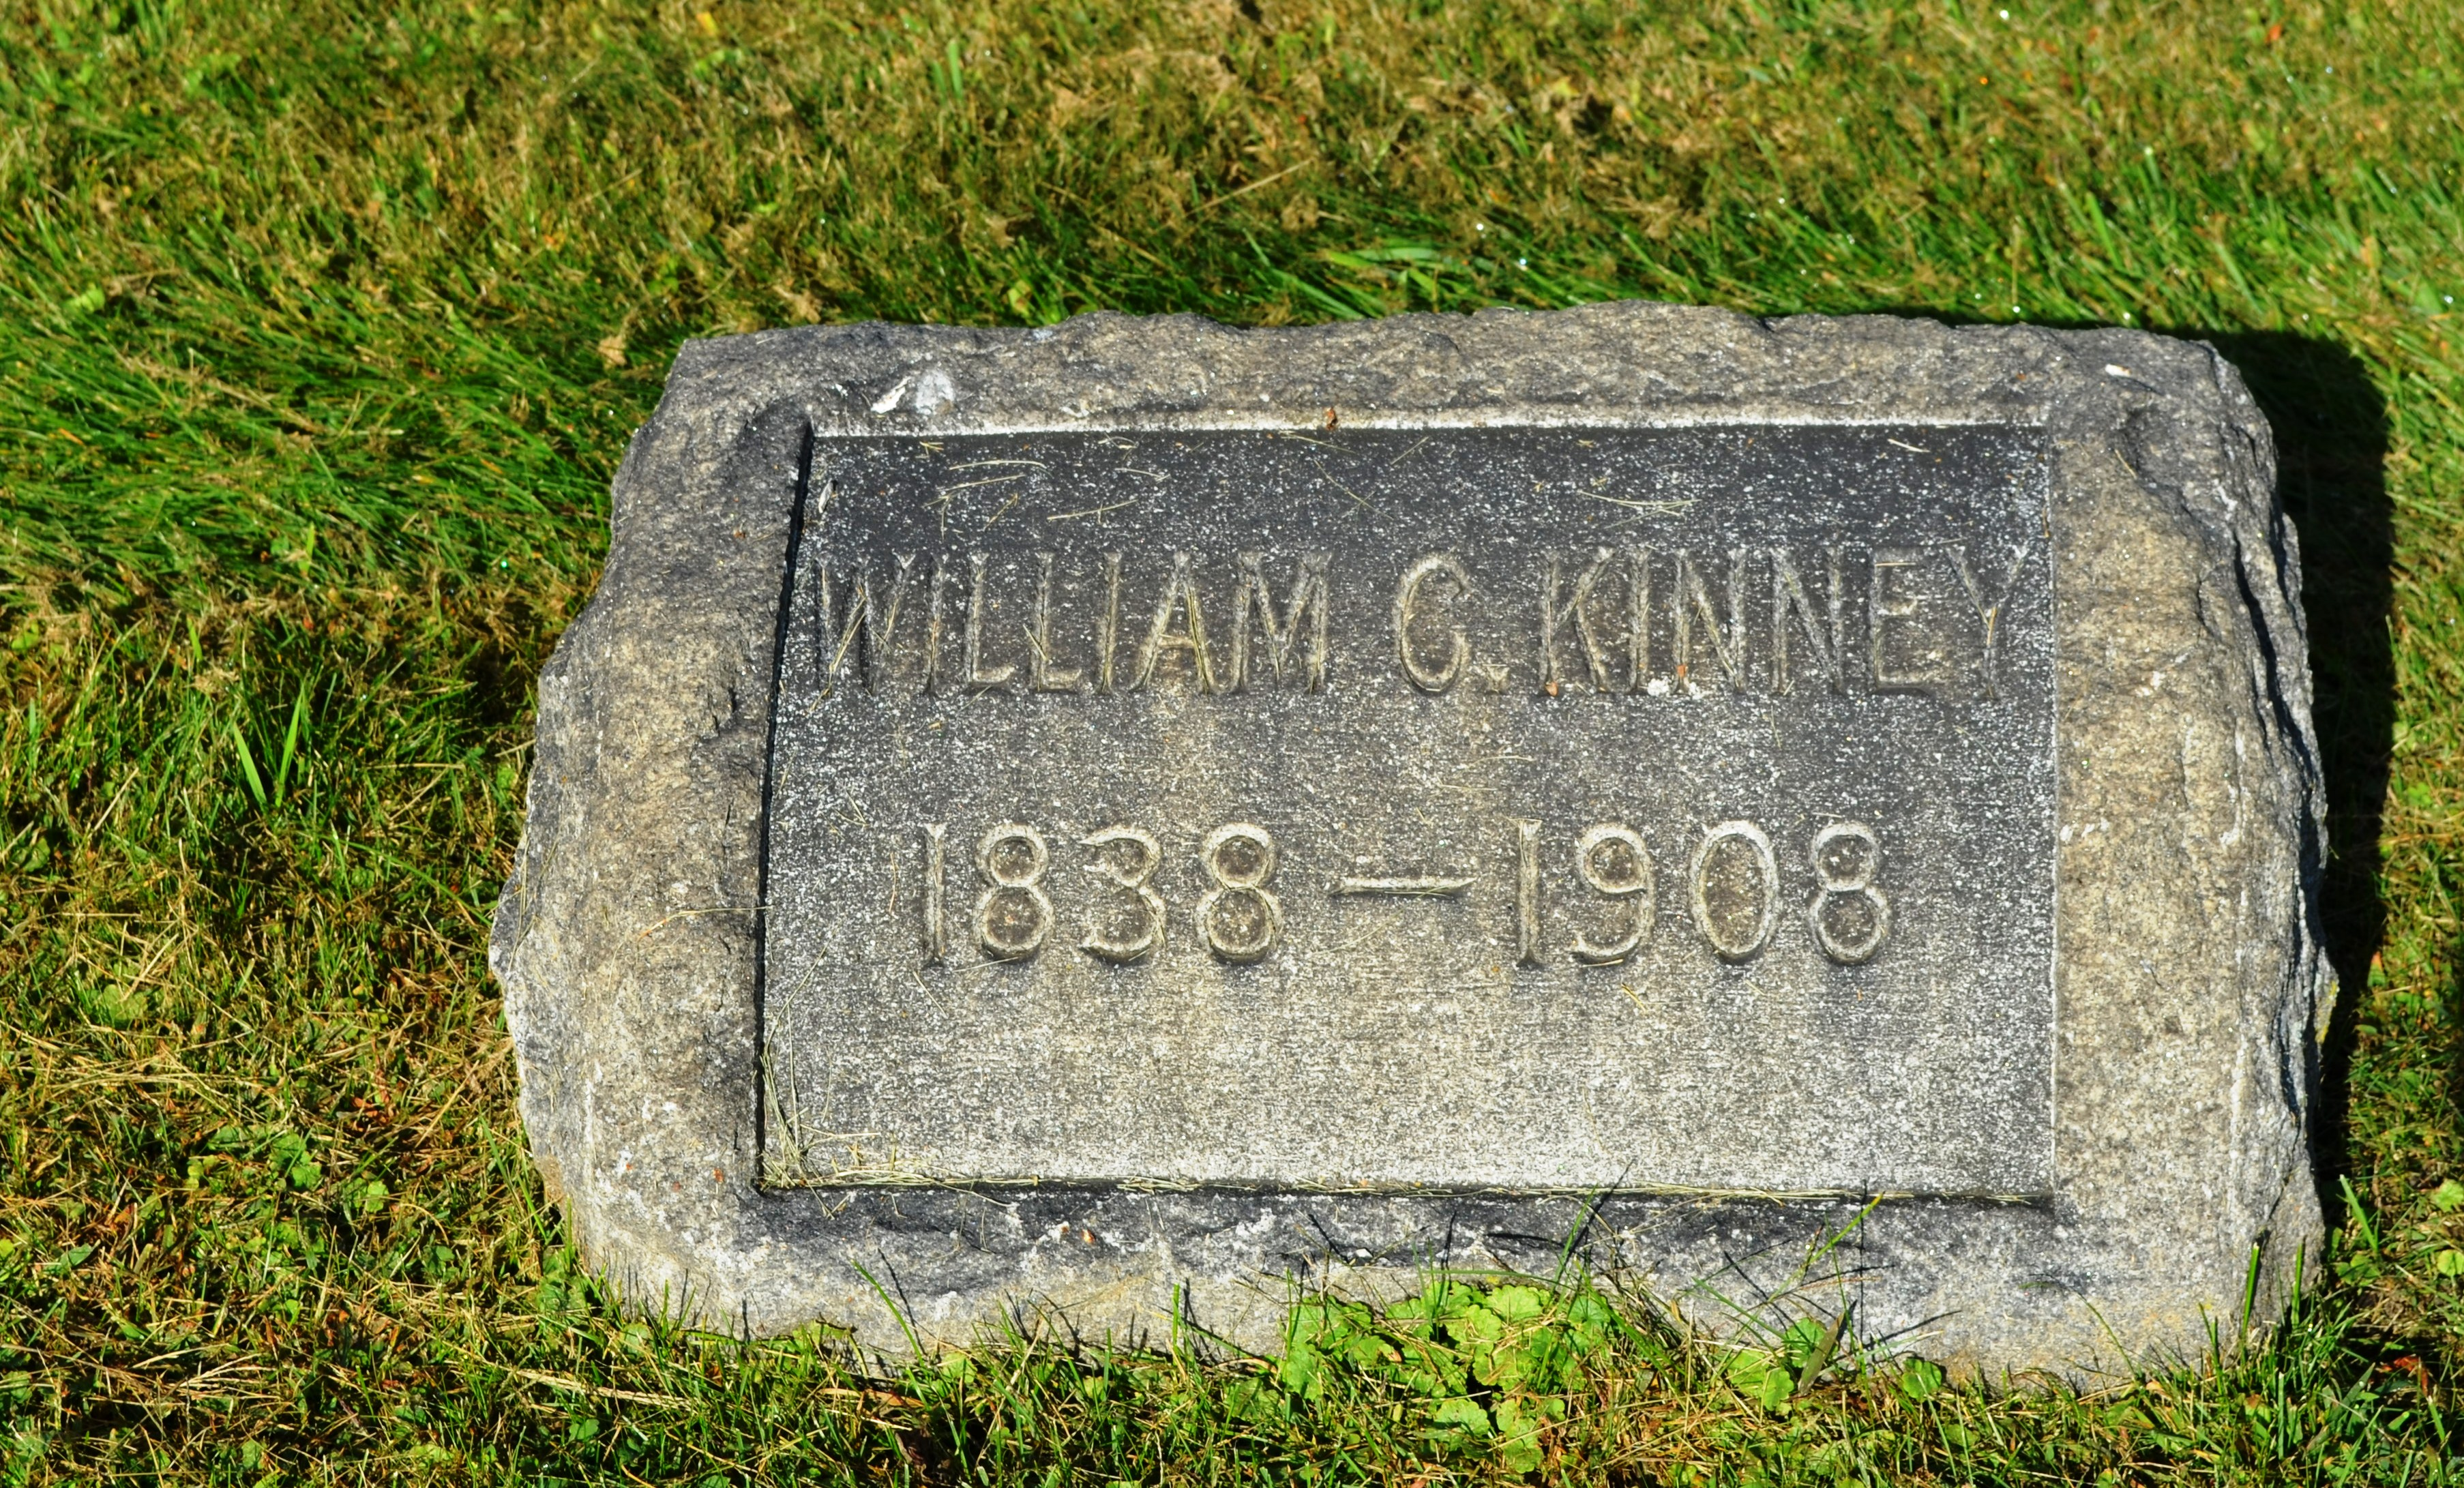 William Crane Kinney